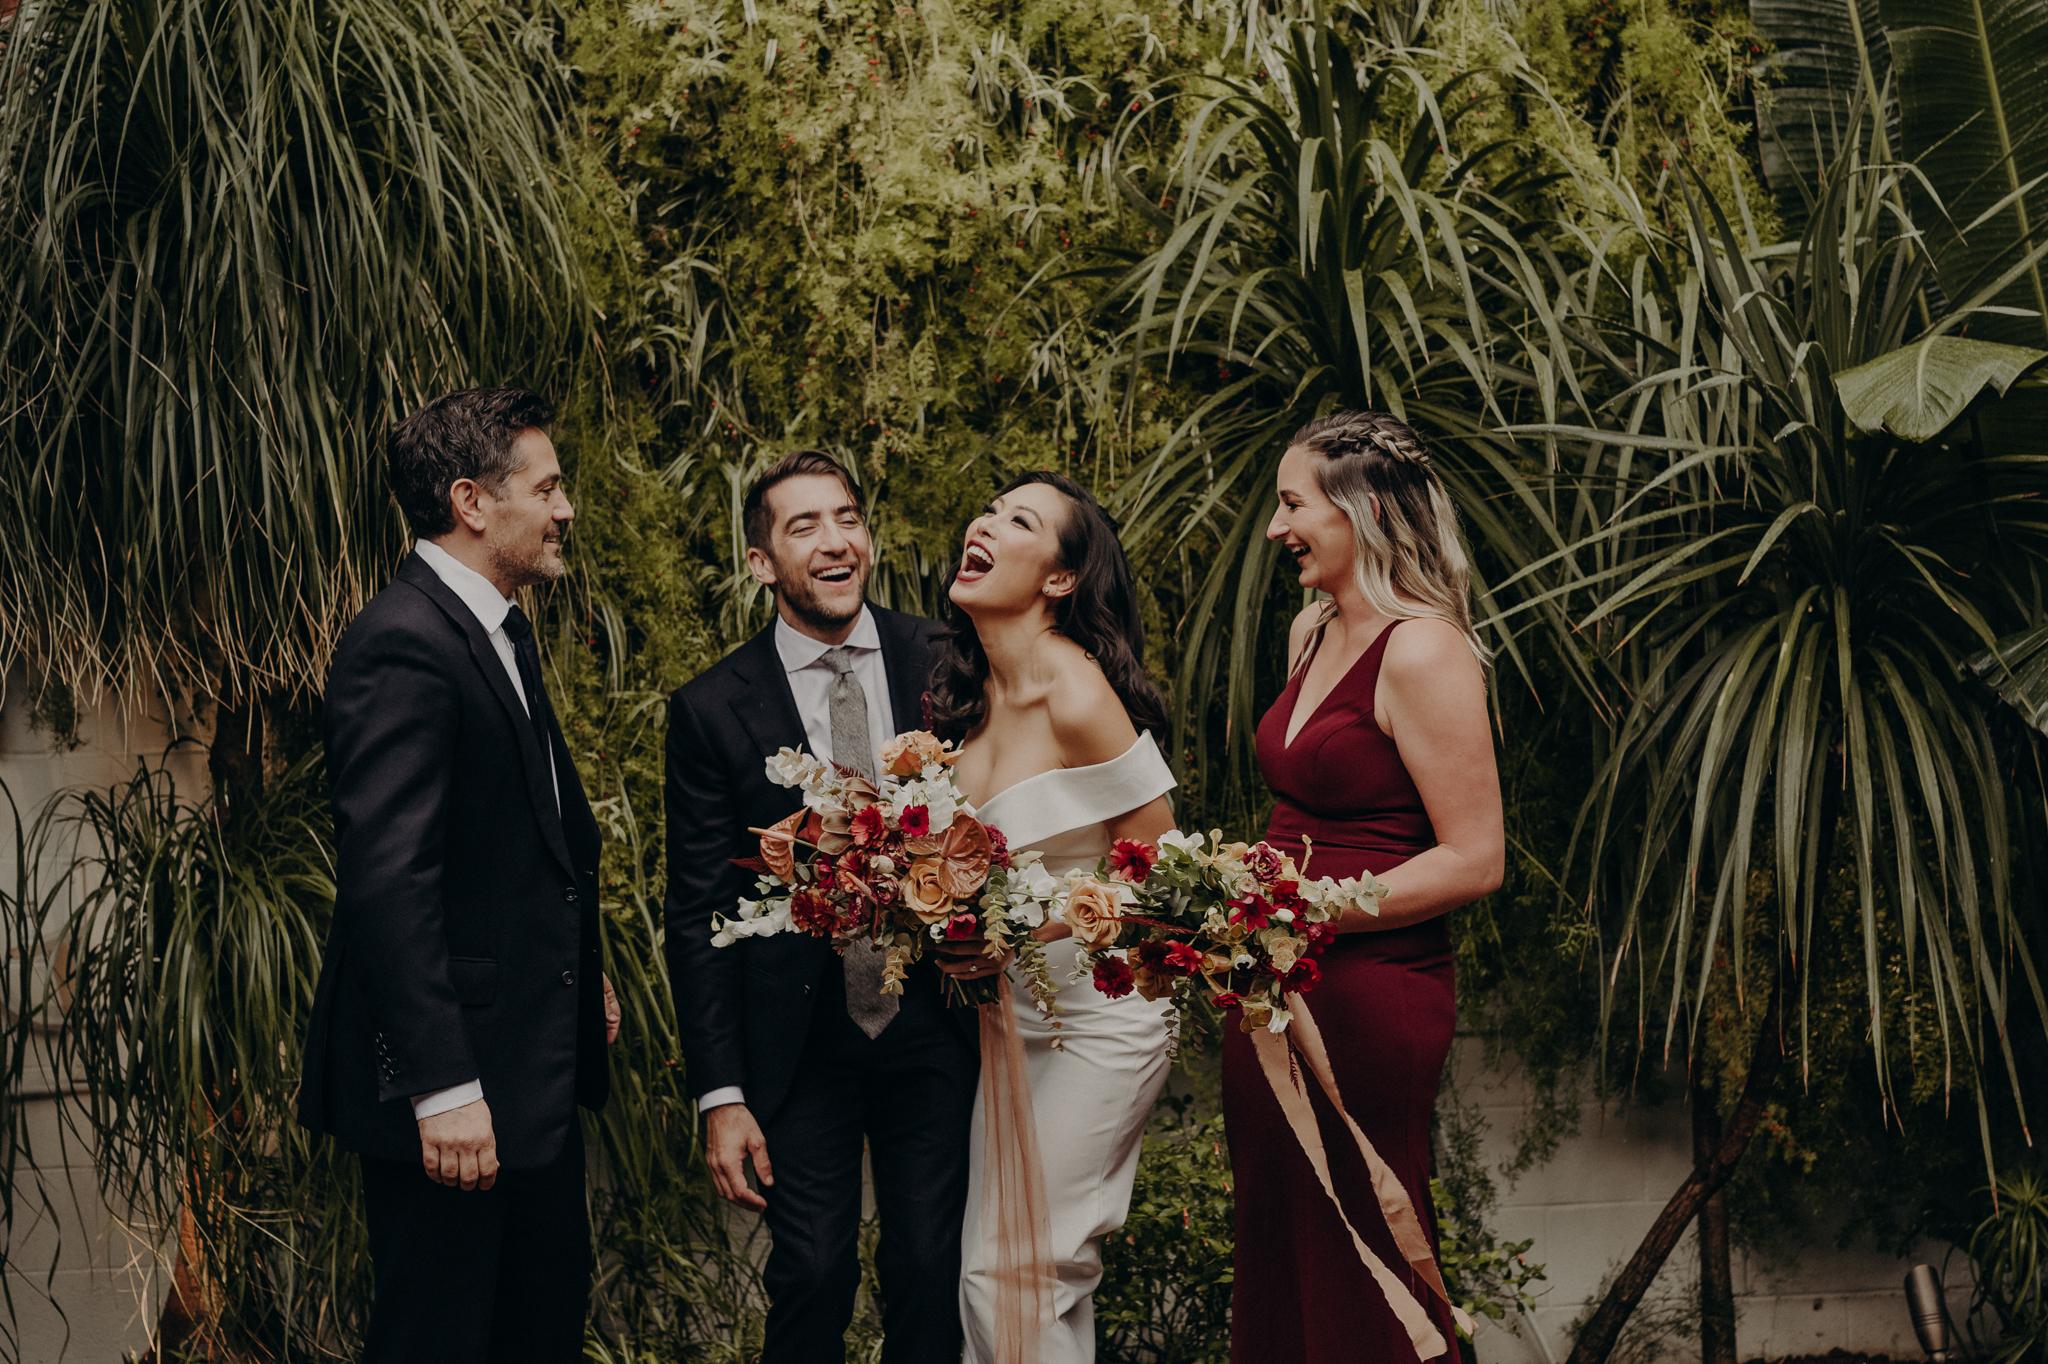 Wedding Photo LA - wedding photographer in los angeles - millwick wedding venue -isaiahandtaylor.com-057.jpg